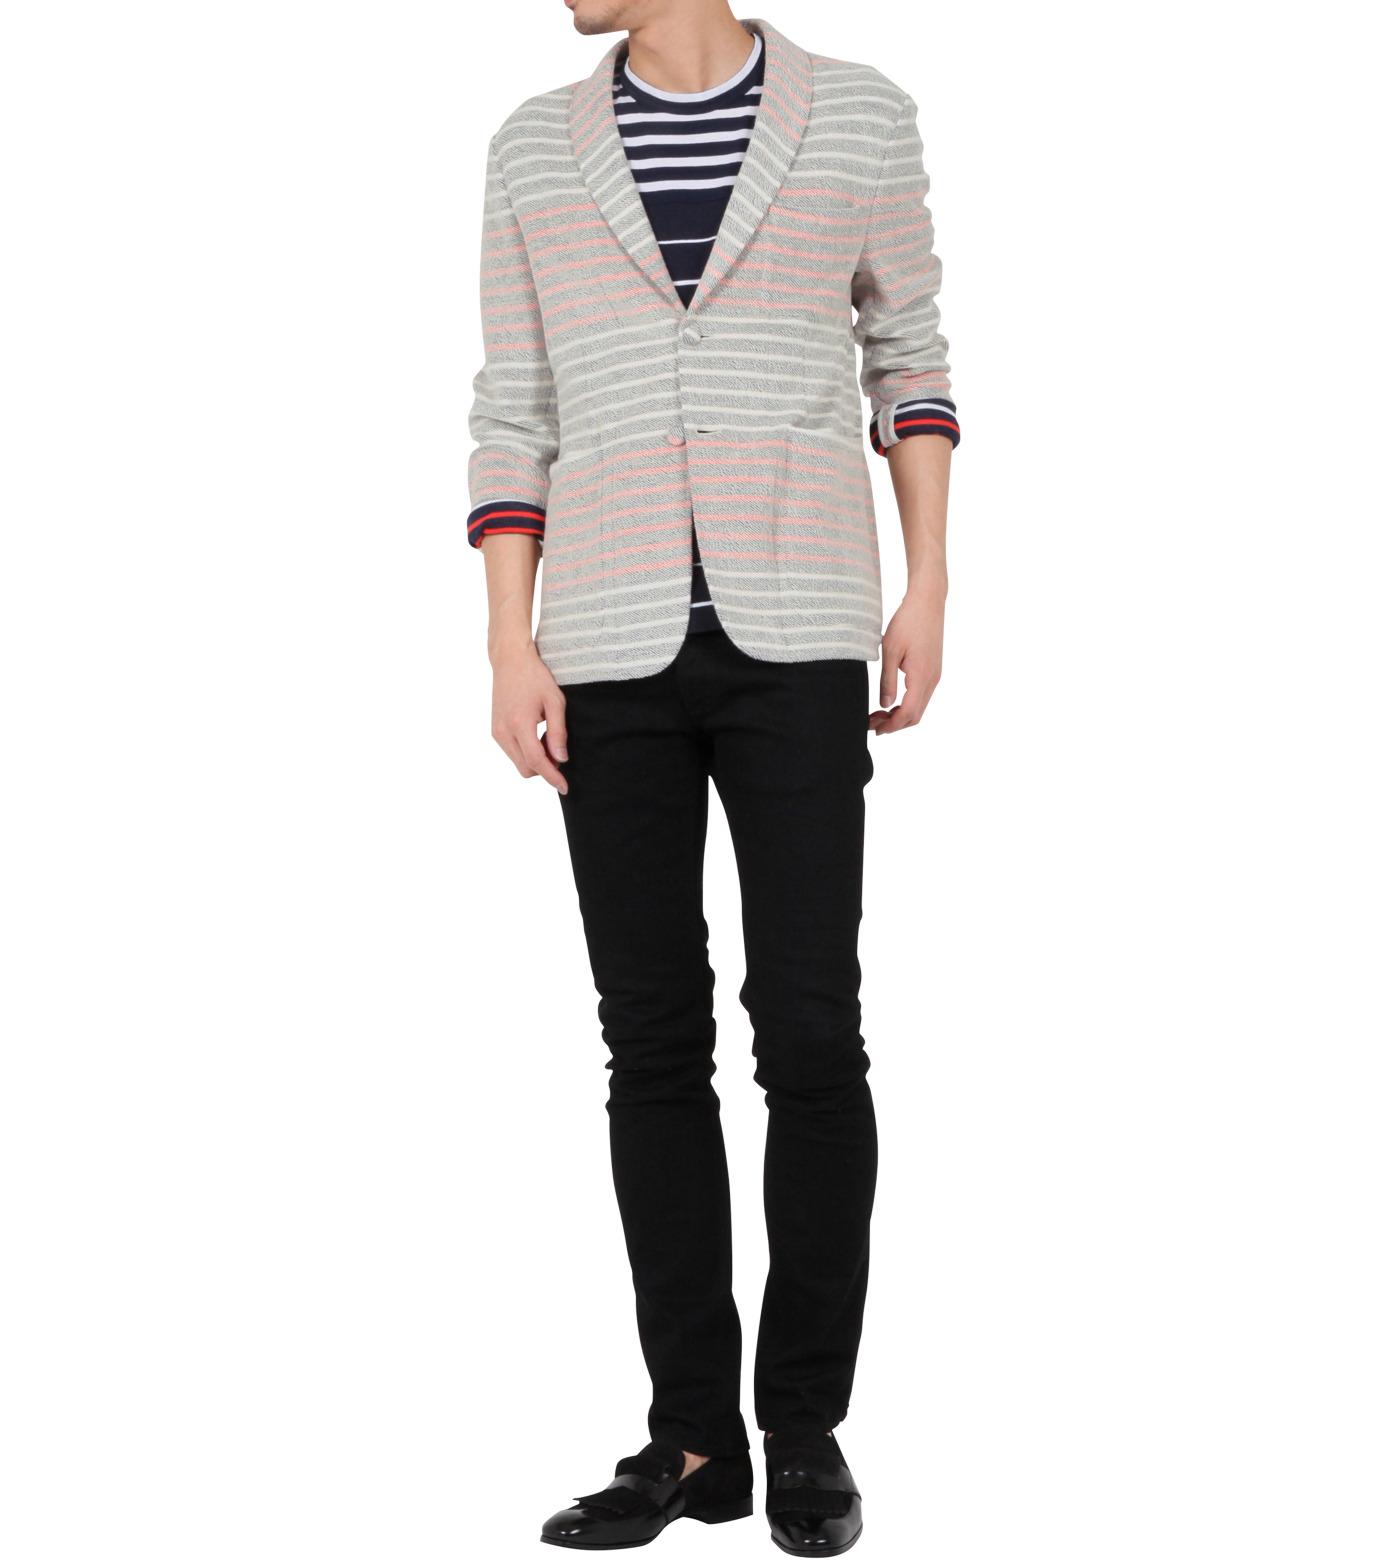 Thom Browne(トムブラウン)のBorder pile jacket-WHITE-MJU065AK6941-4 拡大詳細画像2